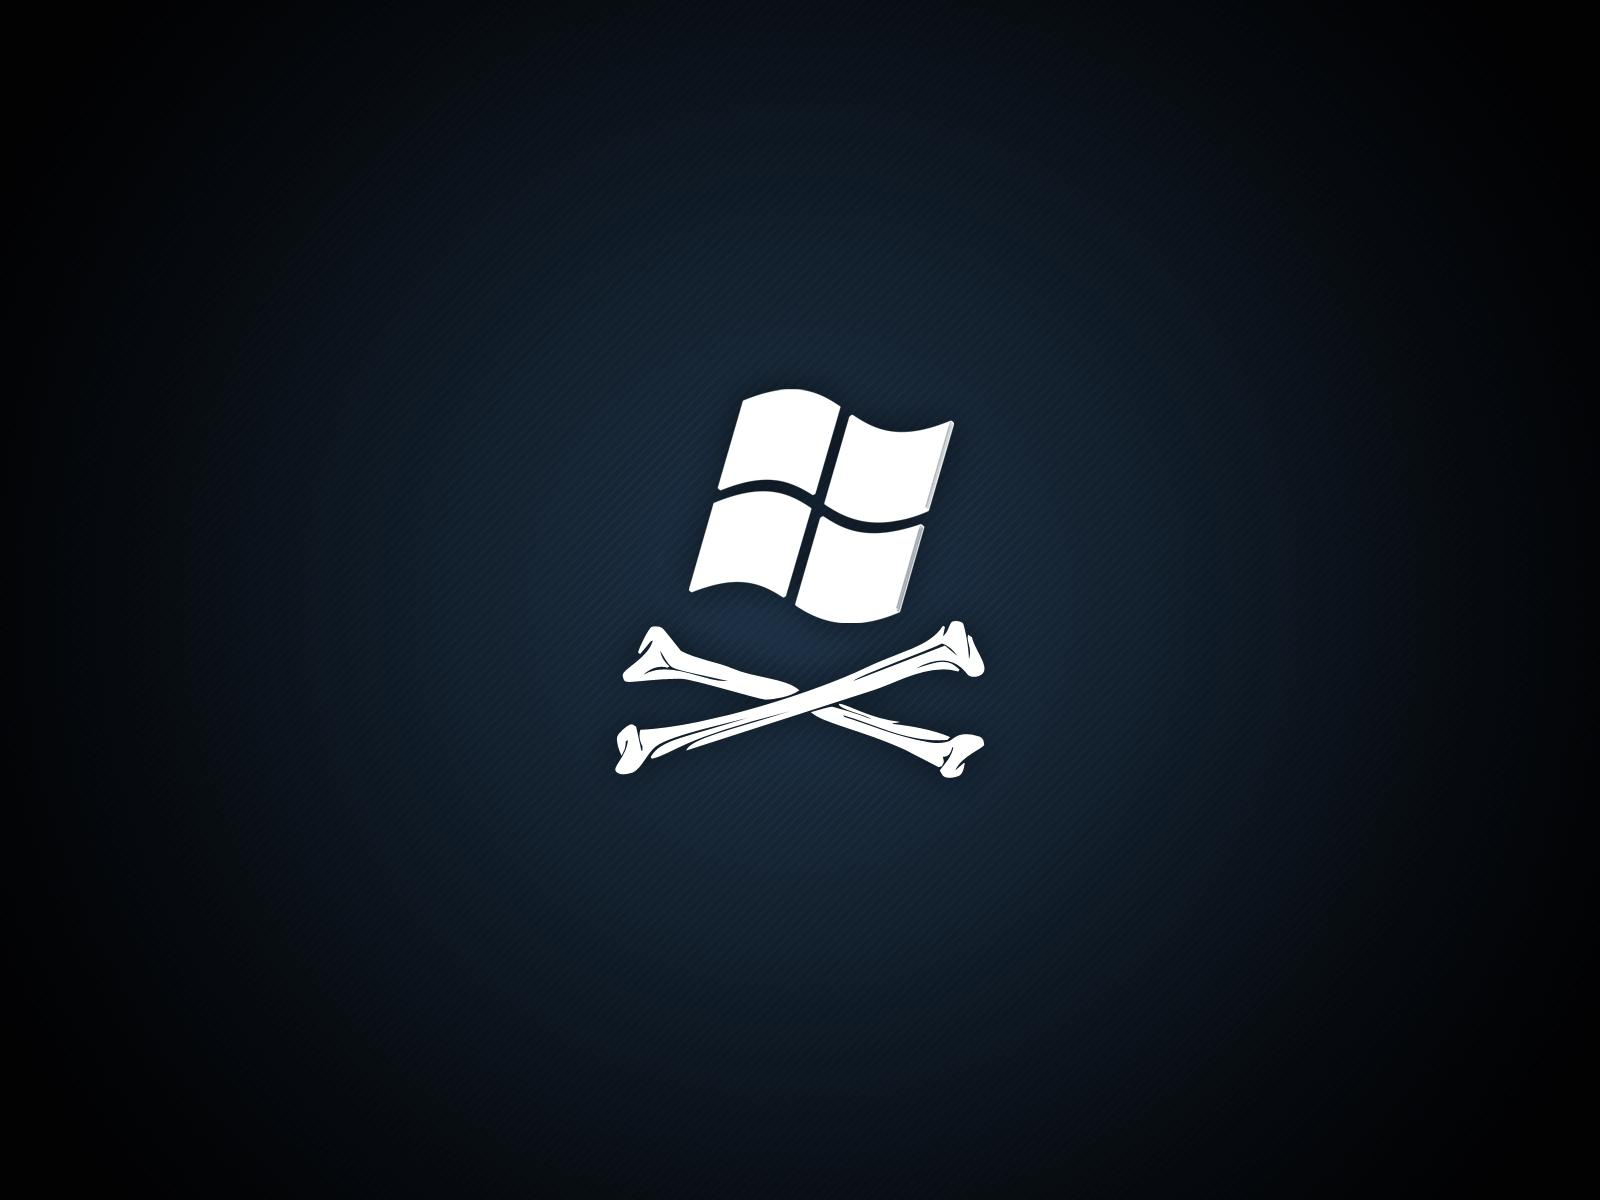 3d Moving Wallpaper Download For Windows 7 Hd Pirates Microsoft Windows Logos Desktop Background